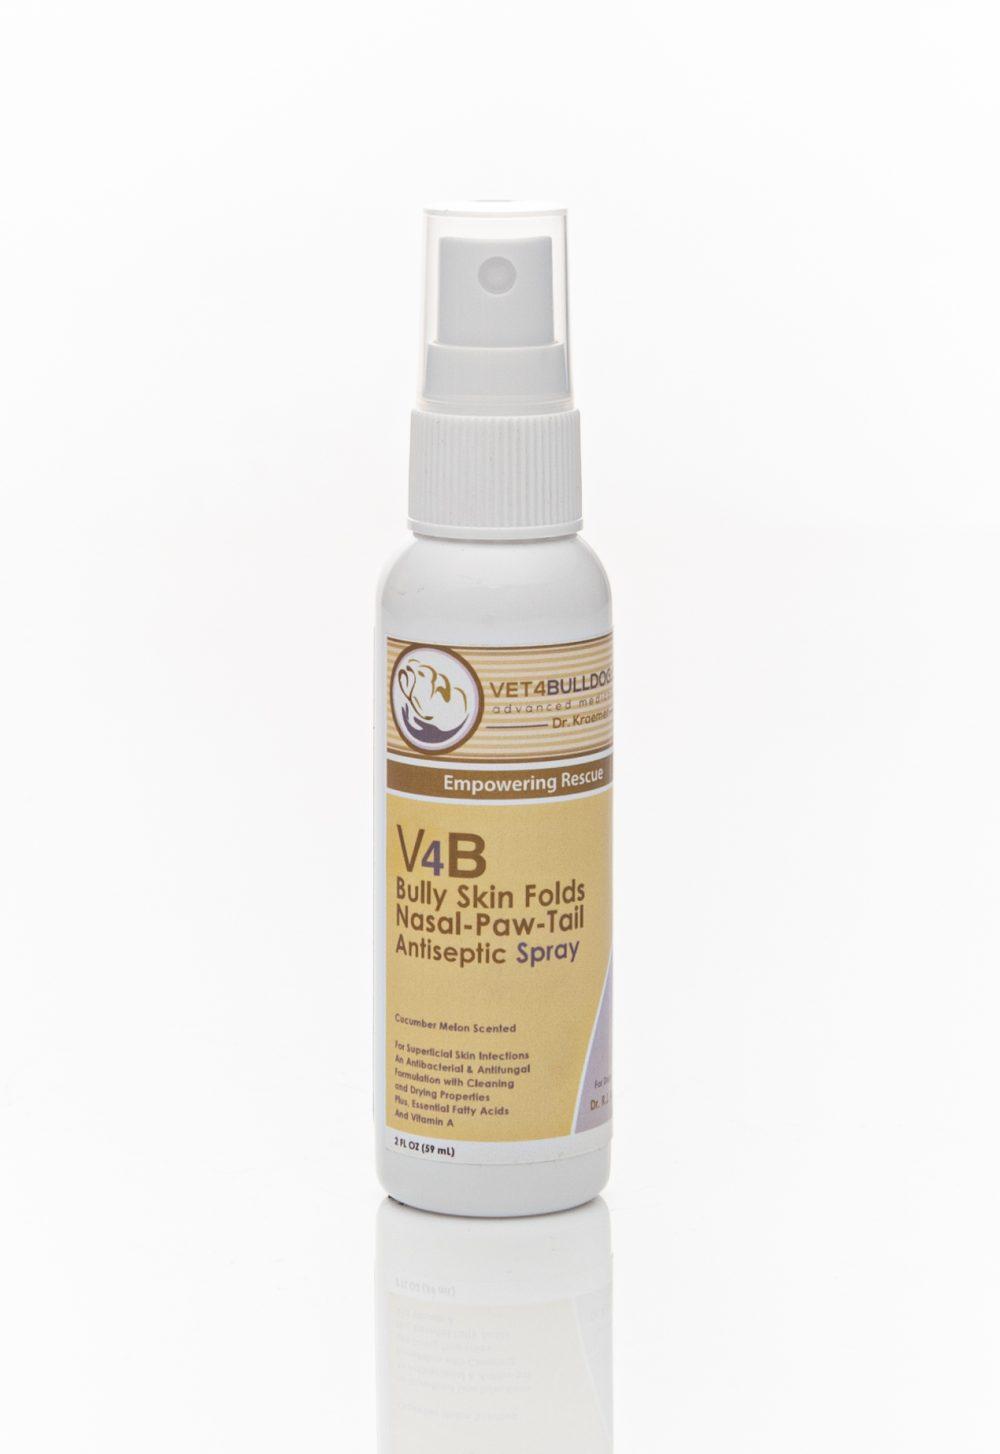 V4B Skin Fold Antiseptic Spray SAMPLE for Bulldogs and French Bulldogs